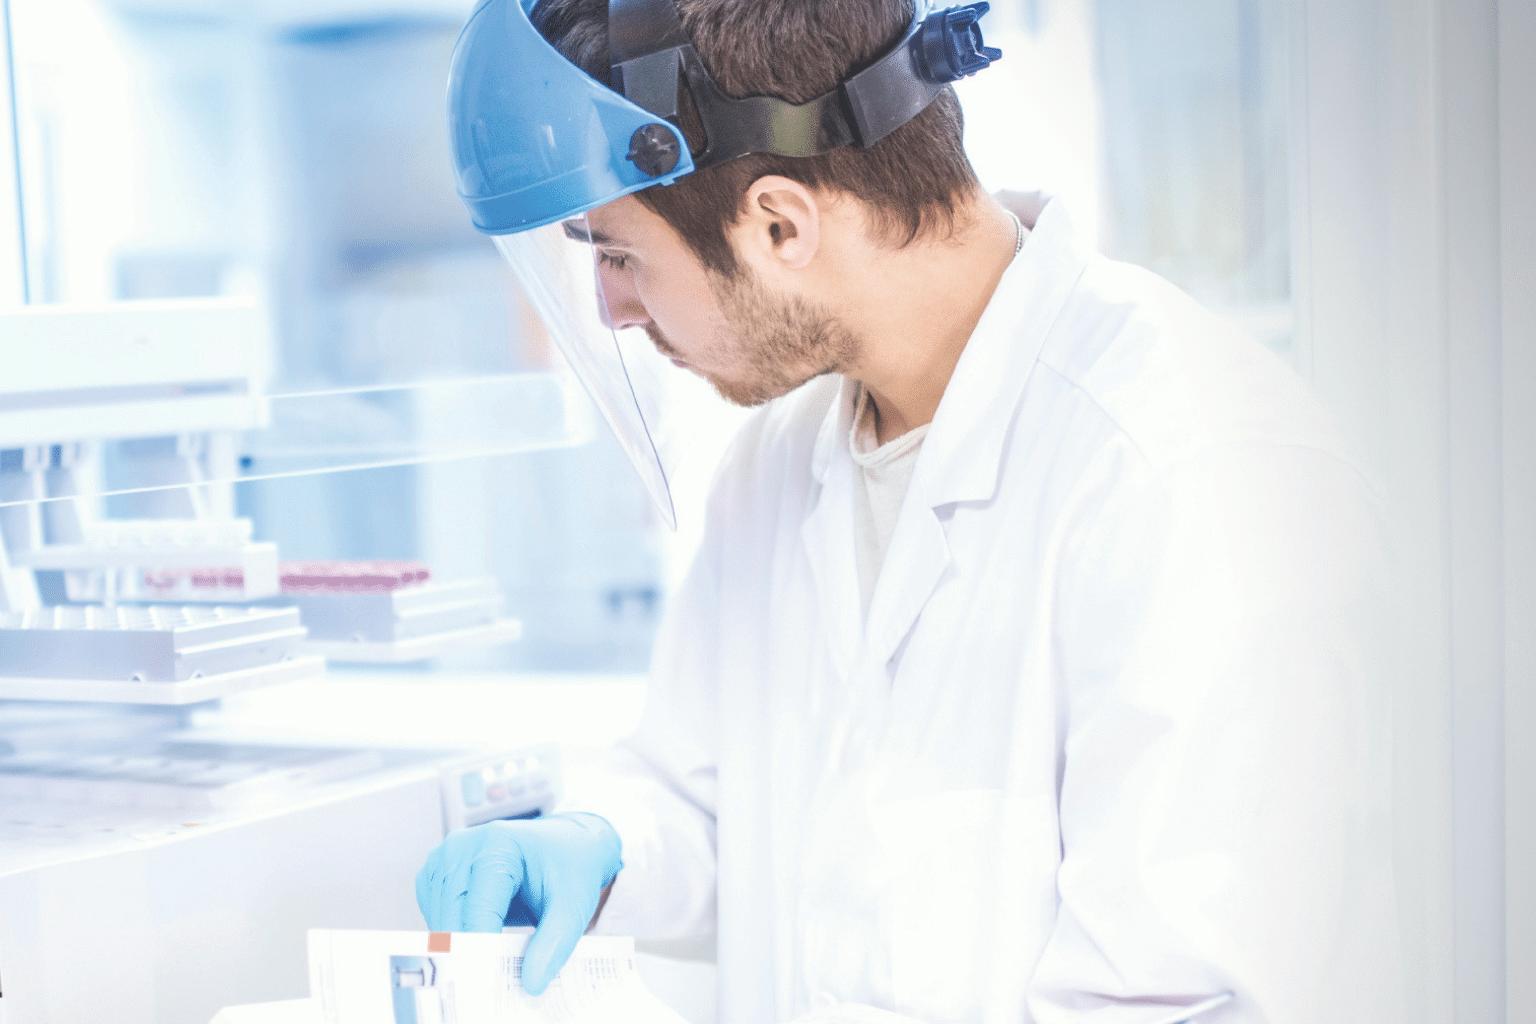 Pharmacy technician in cleanroom